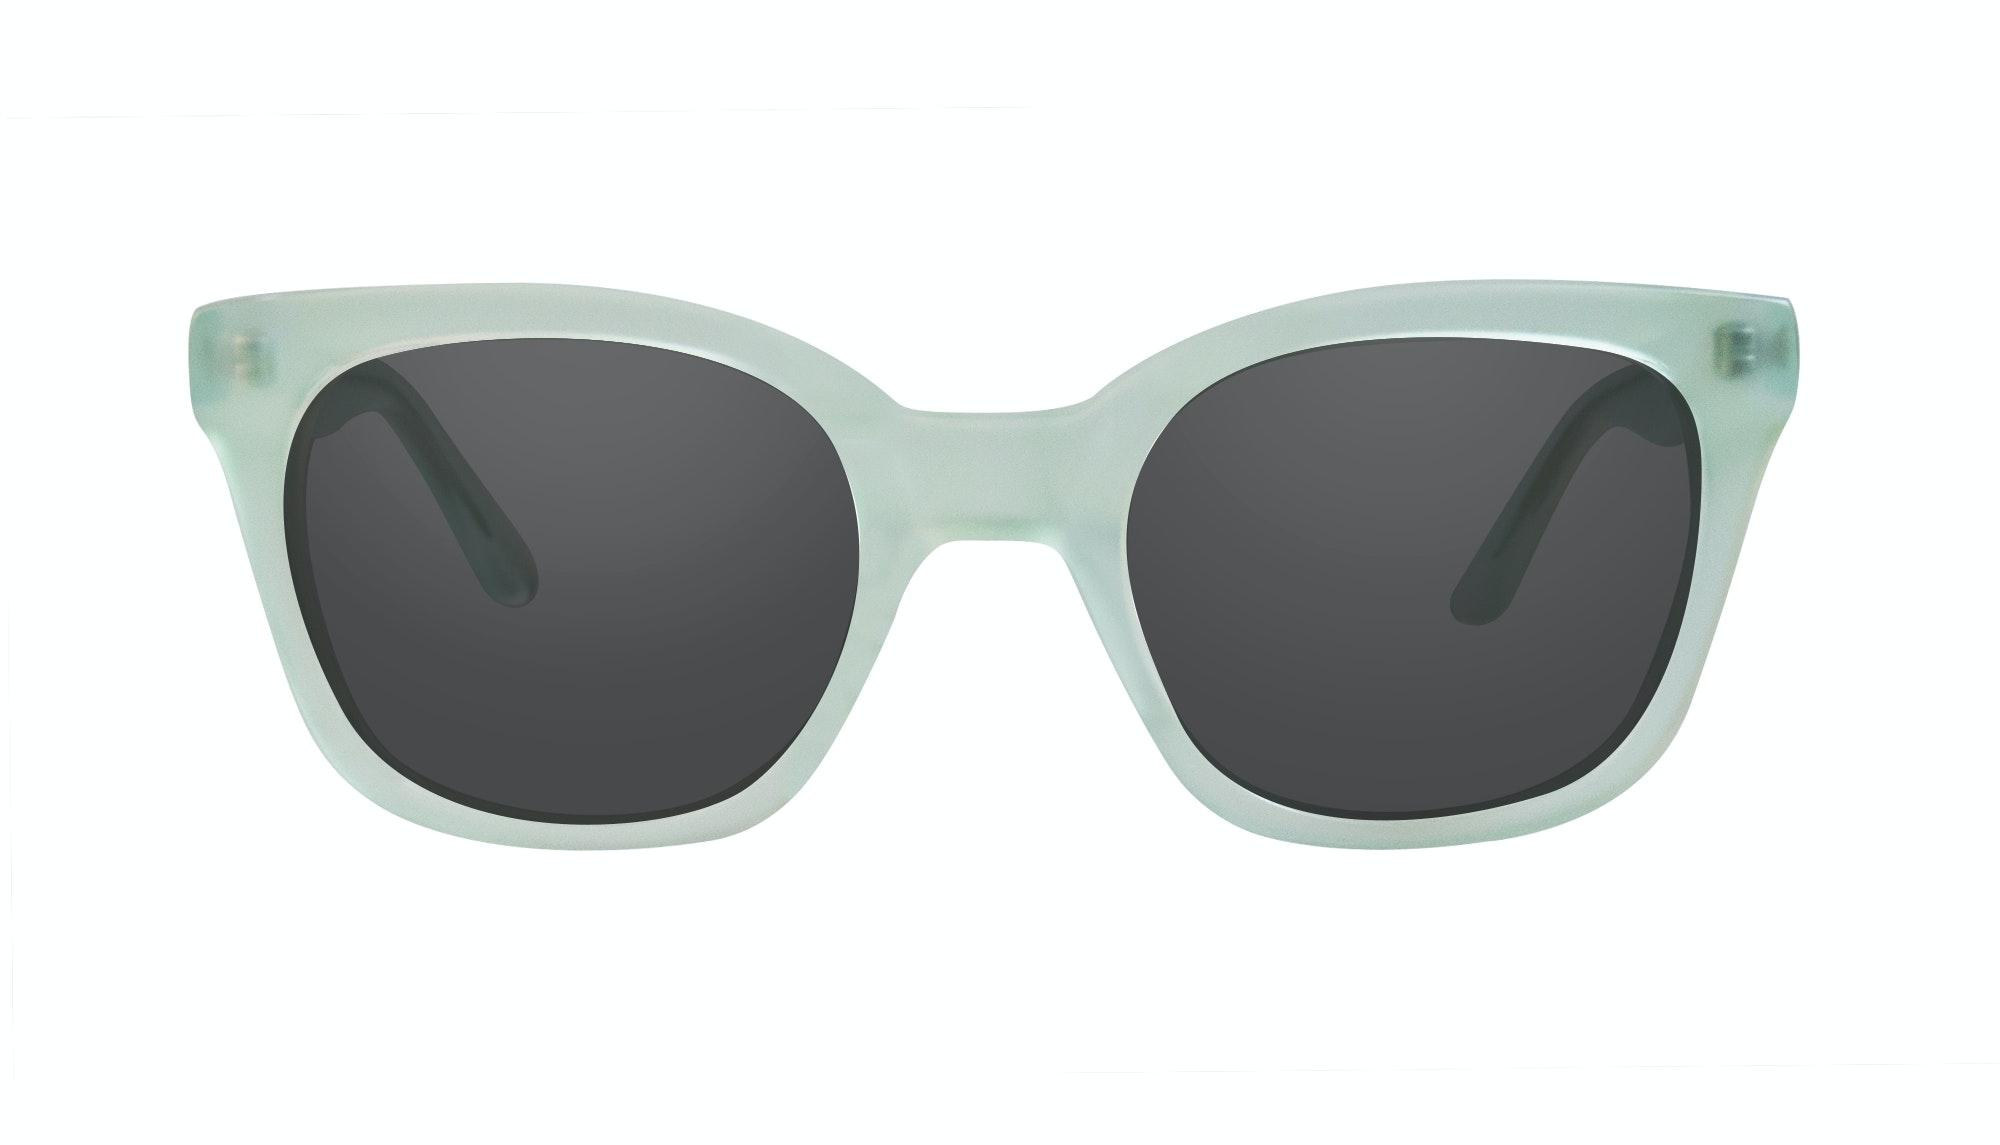 Affordable Fashion Glasses Square Sunglasses Women Jack & Norma Spaceship